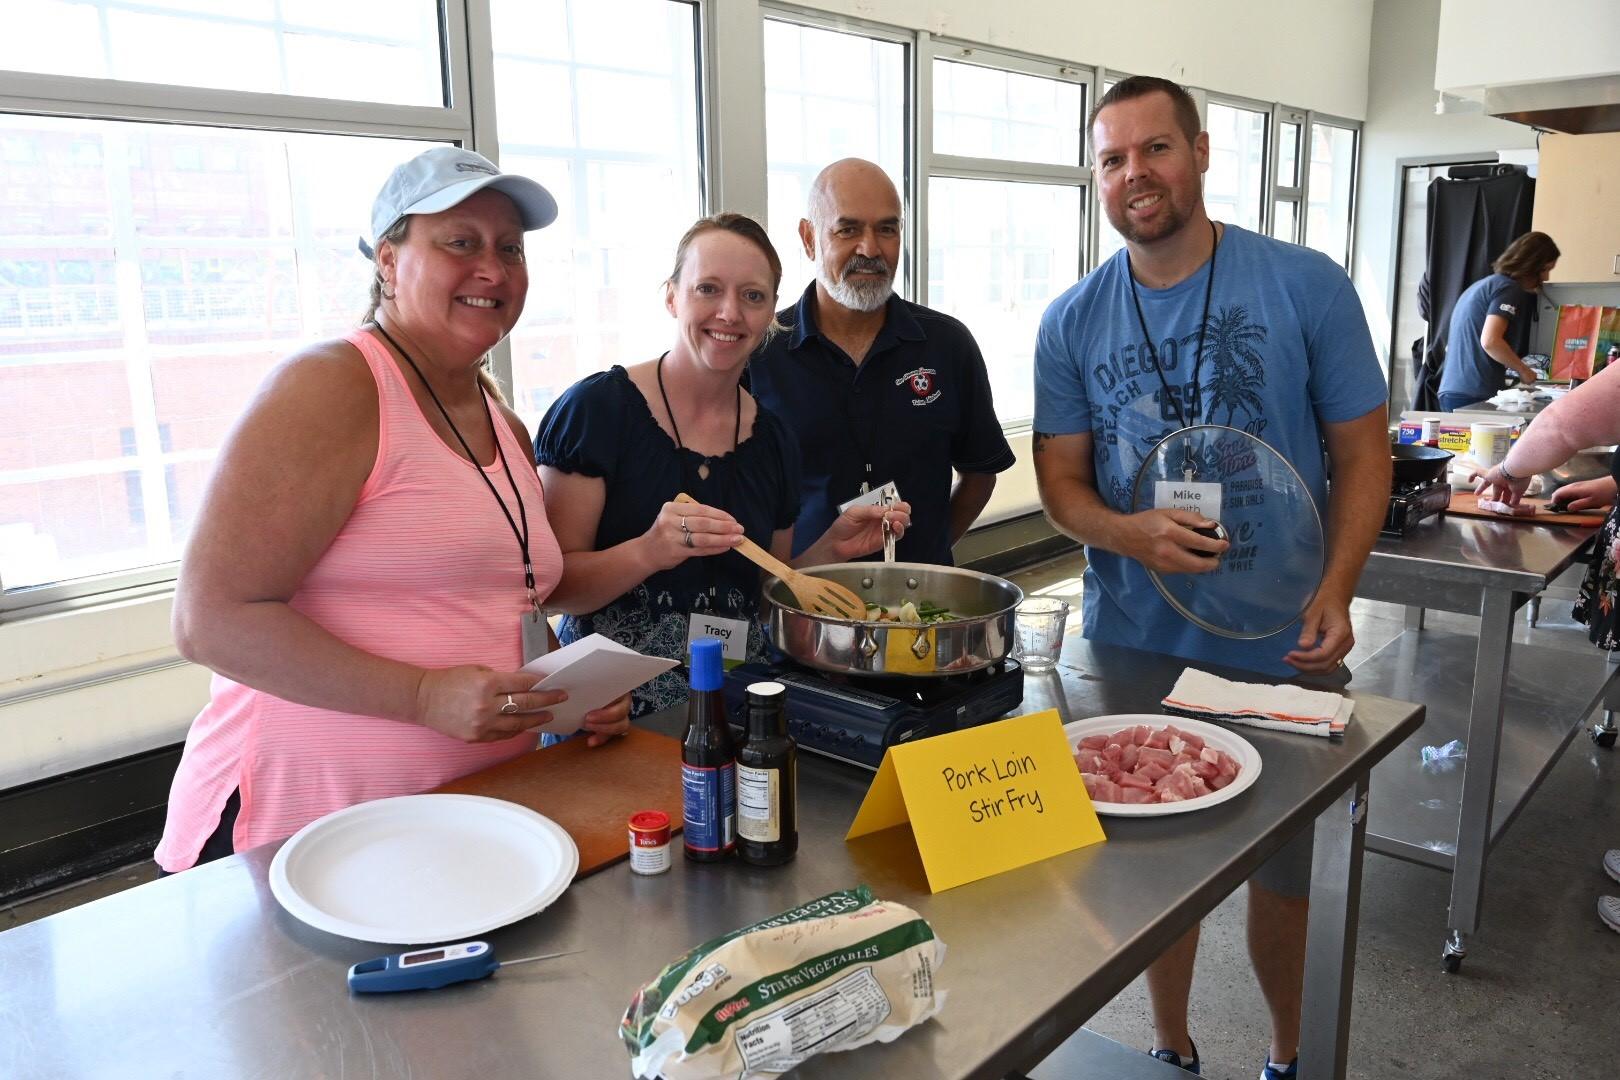 Food U participants prepare pork loin stir fry. Photo credit: Joseph L. Murphy/Iowa Soybean Association